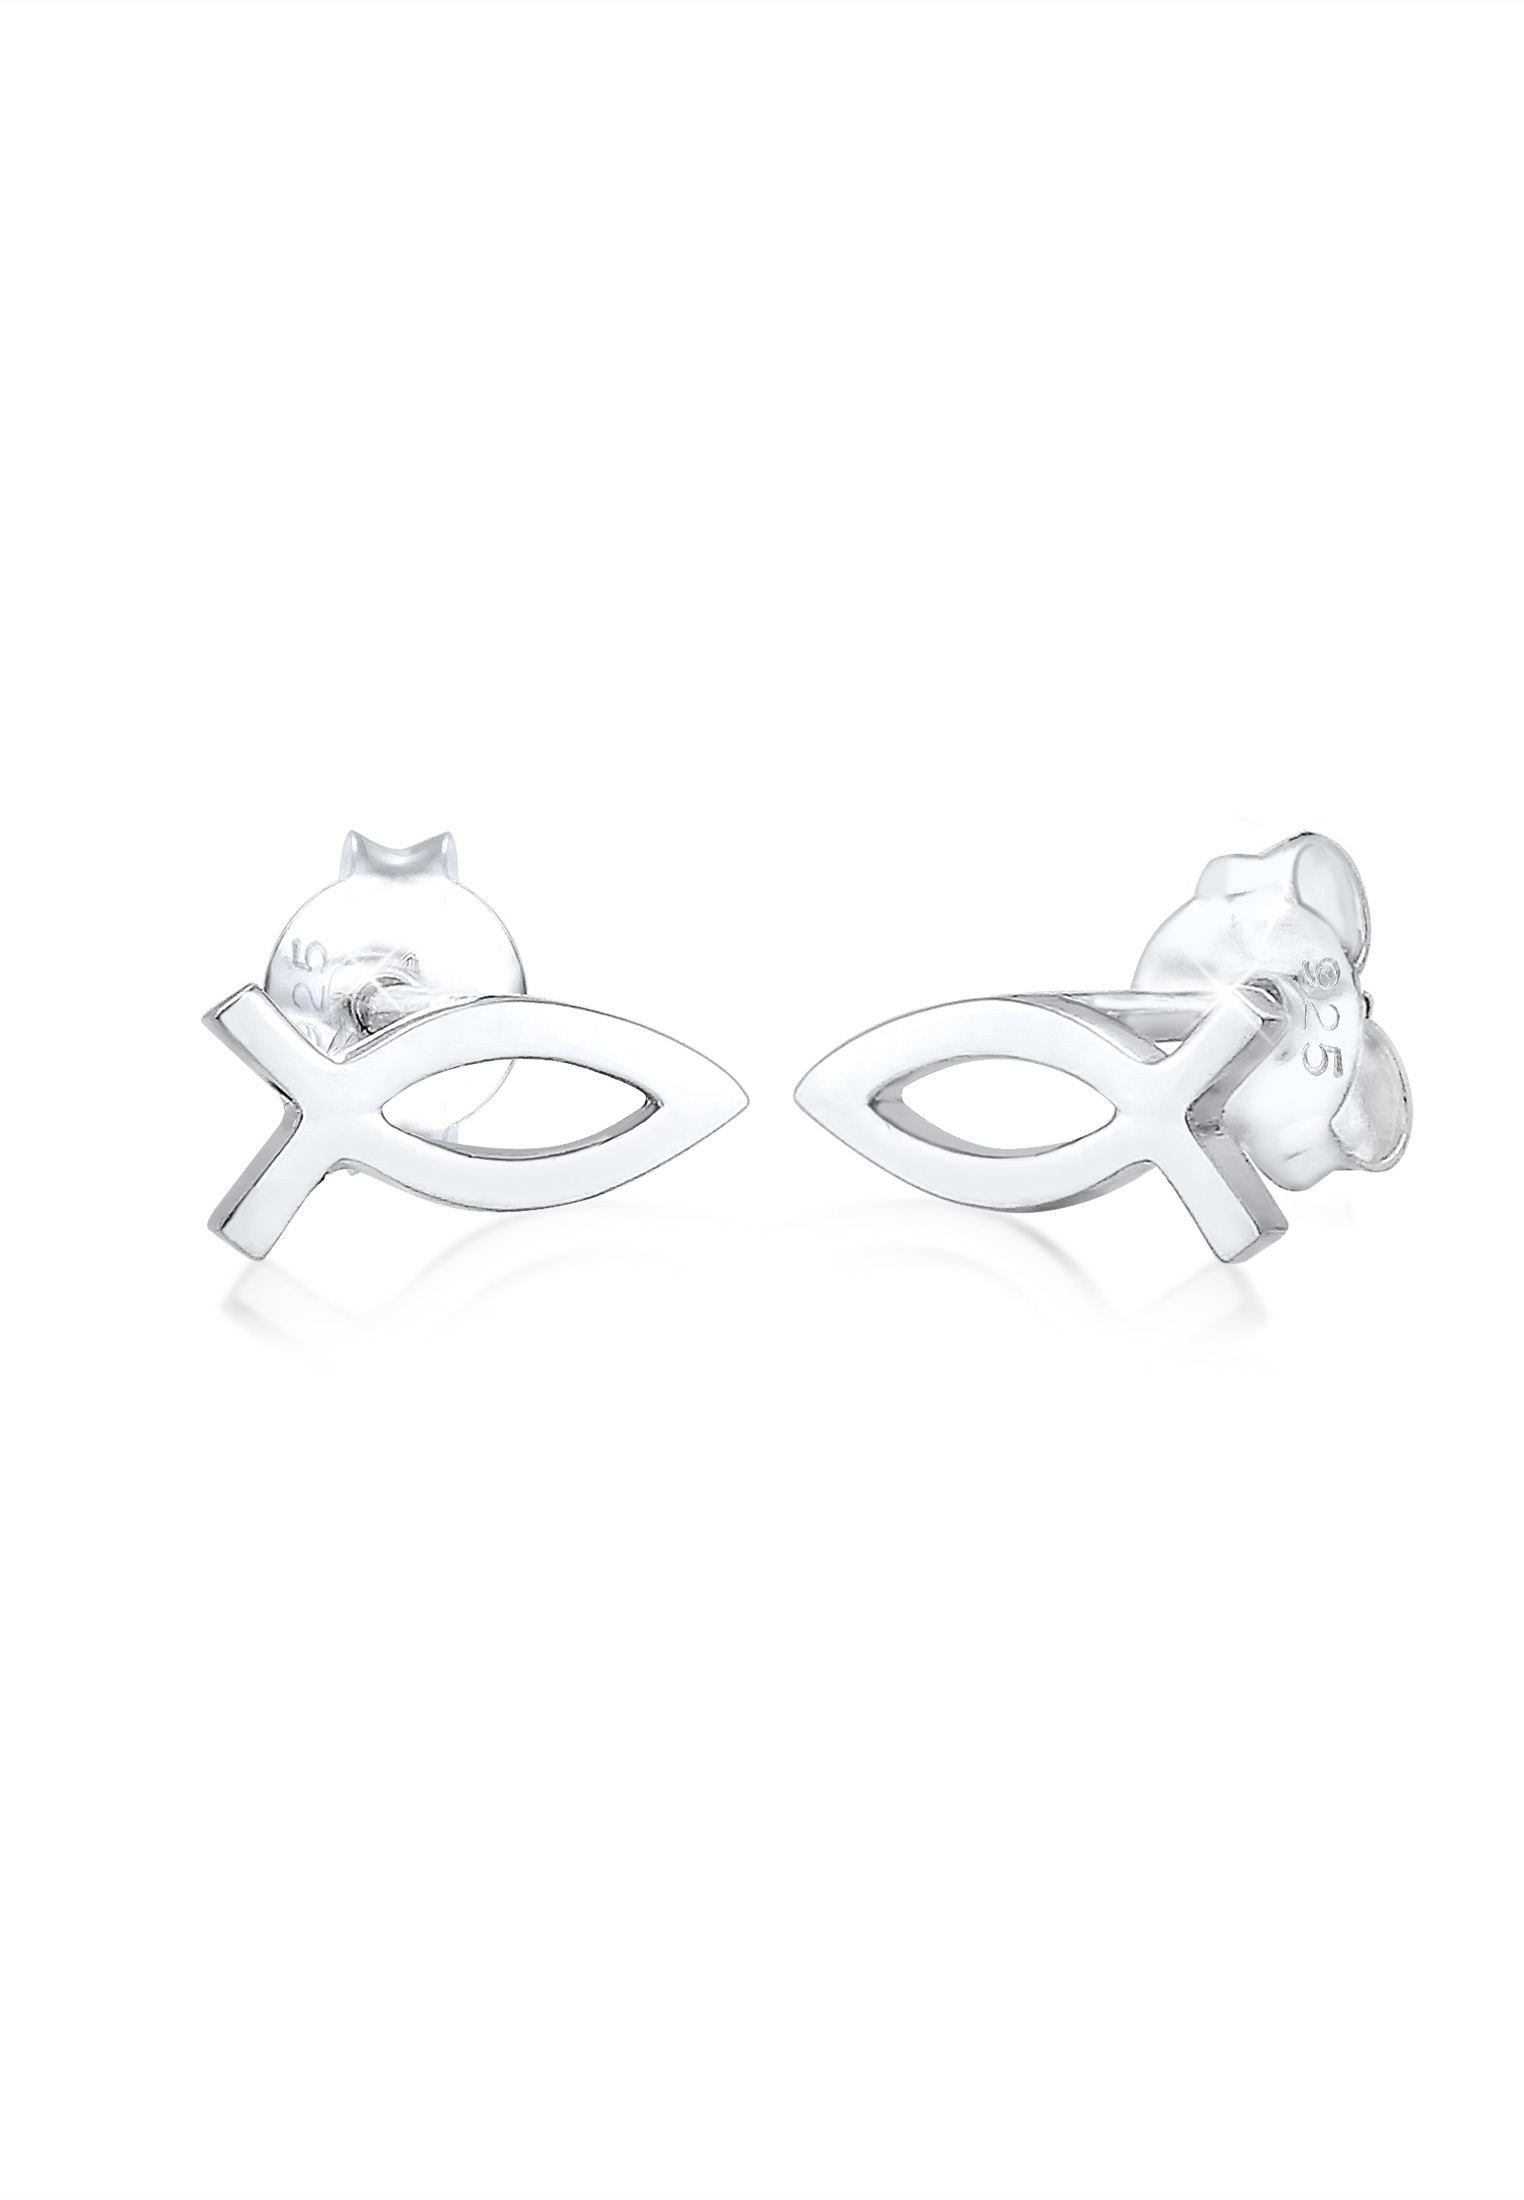 Ohrring Fisch | 925er Sterling Silber